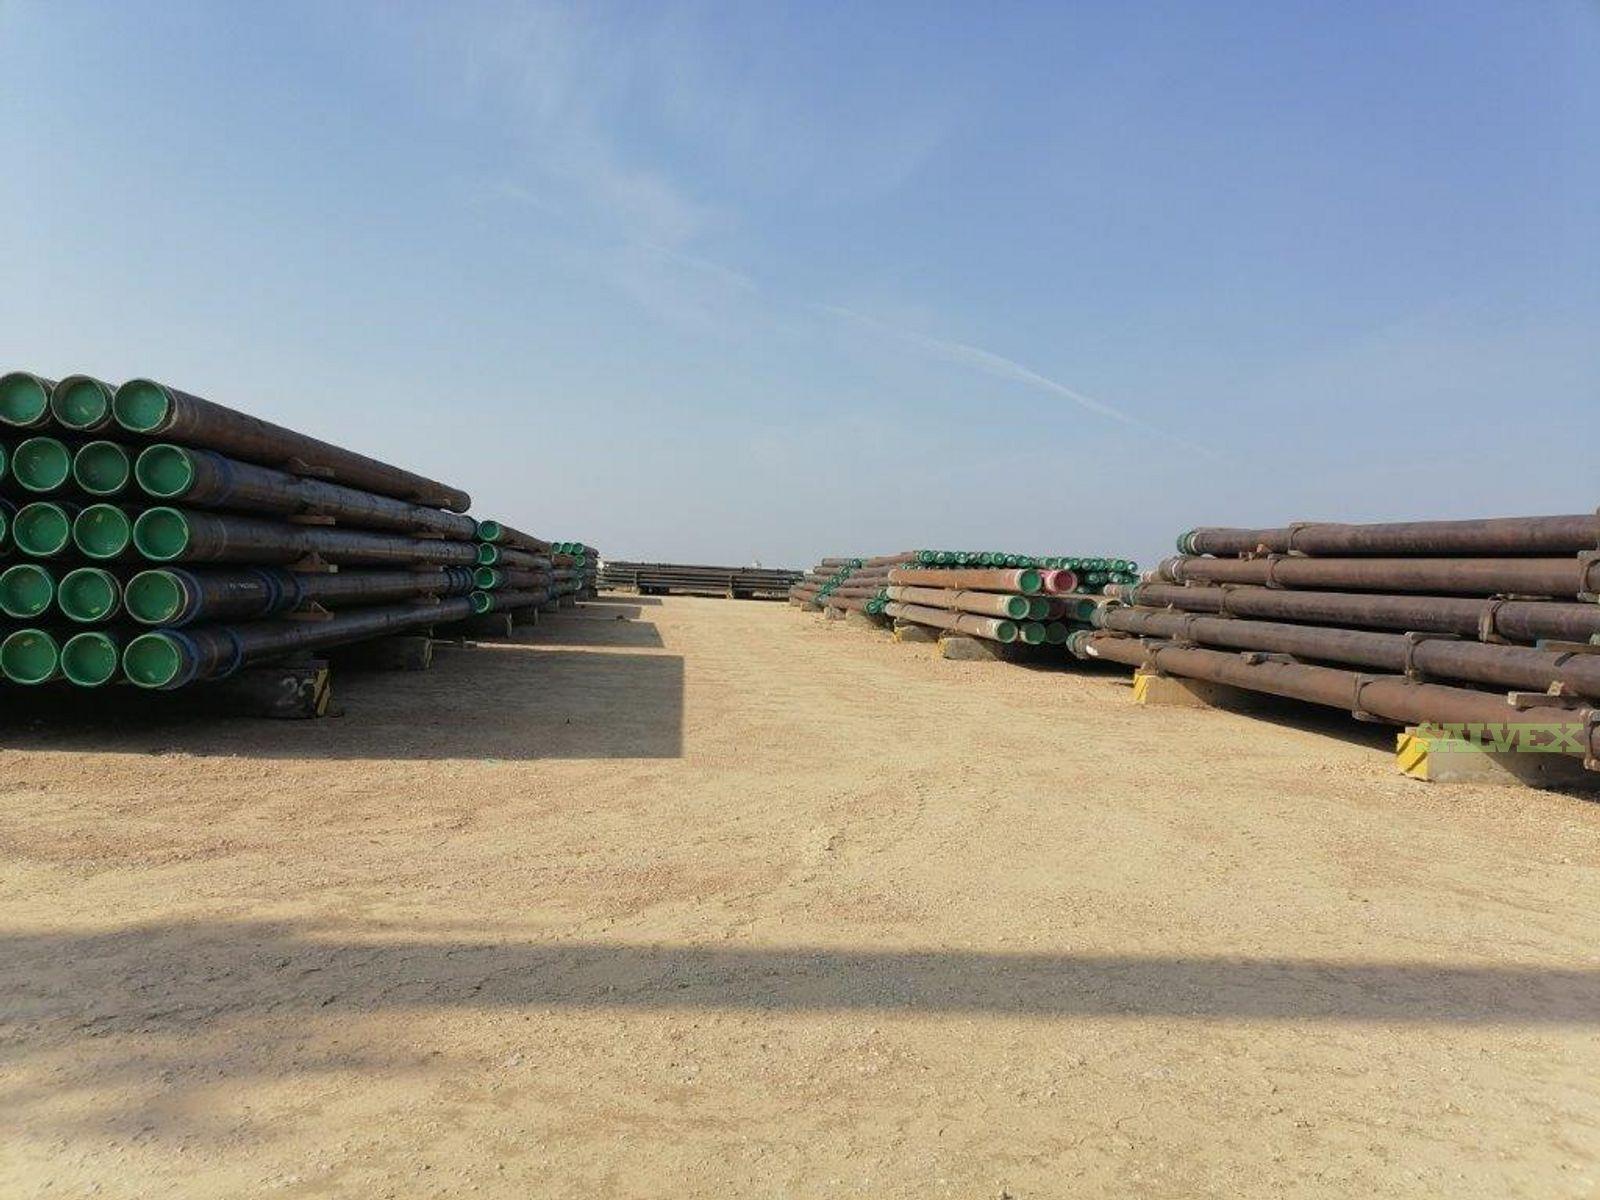 9 3/8 39# Q125 TSH wedge 513 DPLS SMLS Surplus Casing (1,925 Feet / 34 Metric Tons)